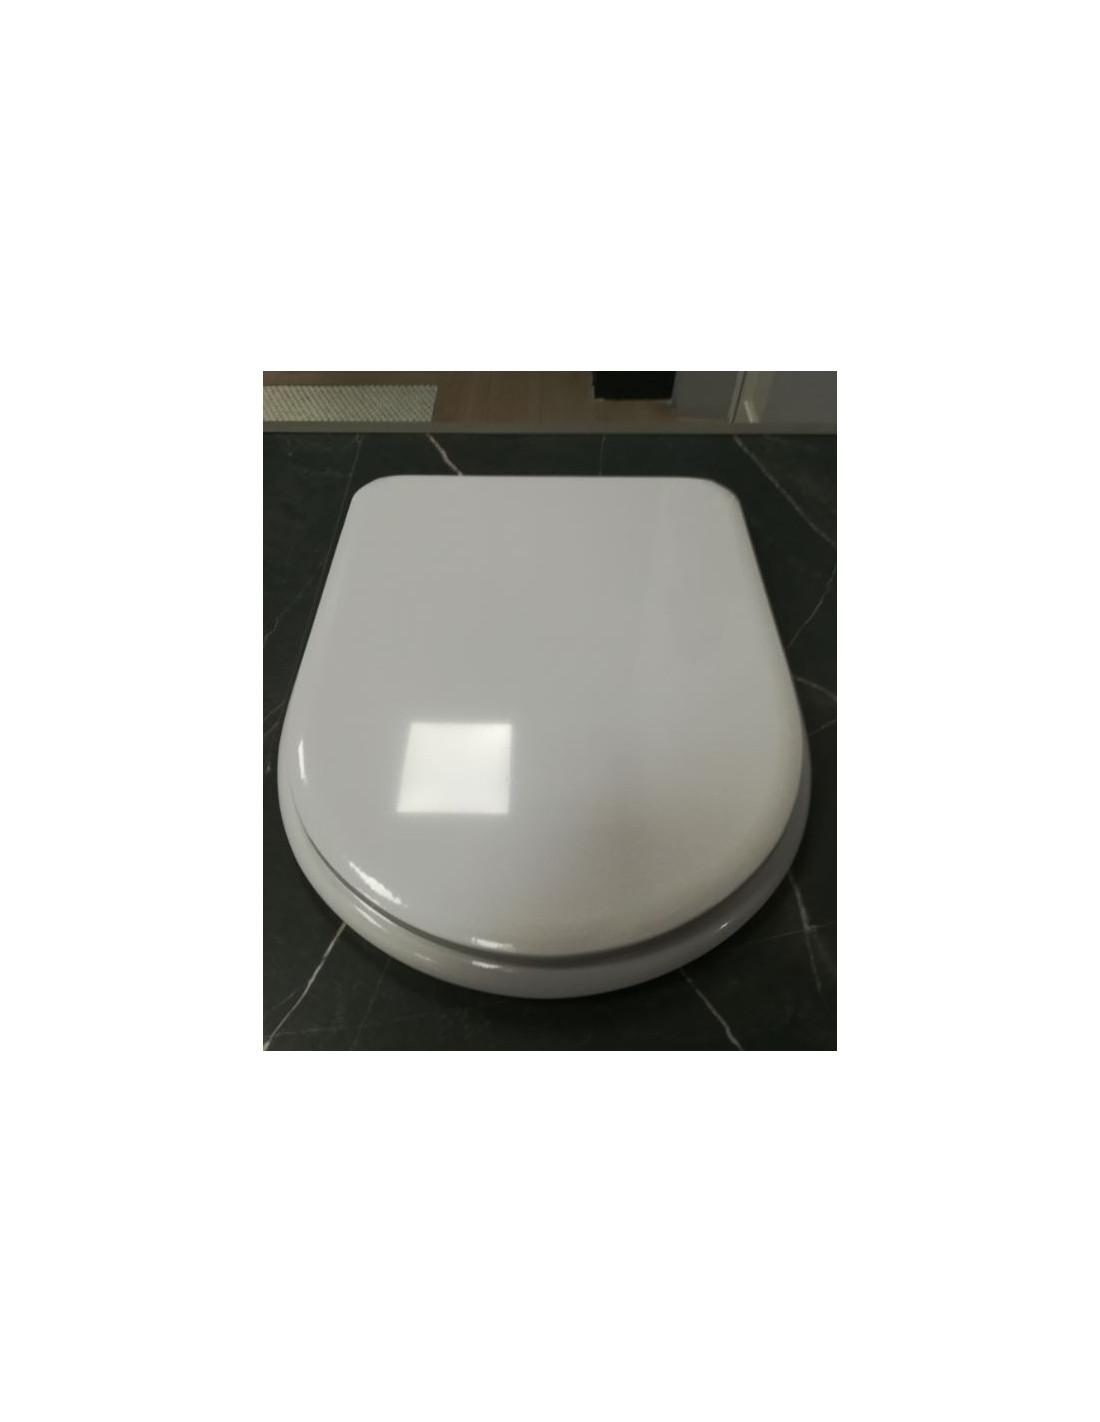 Sedile Wc Dolomite Fleo.Seat Wc Dolomite Clodia Adaptable In Resiwood Tapadelwater Com